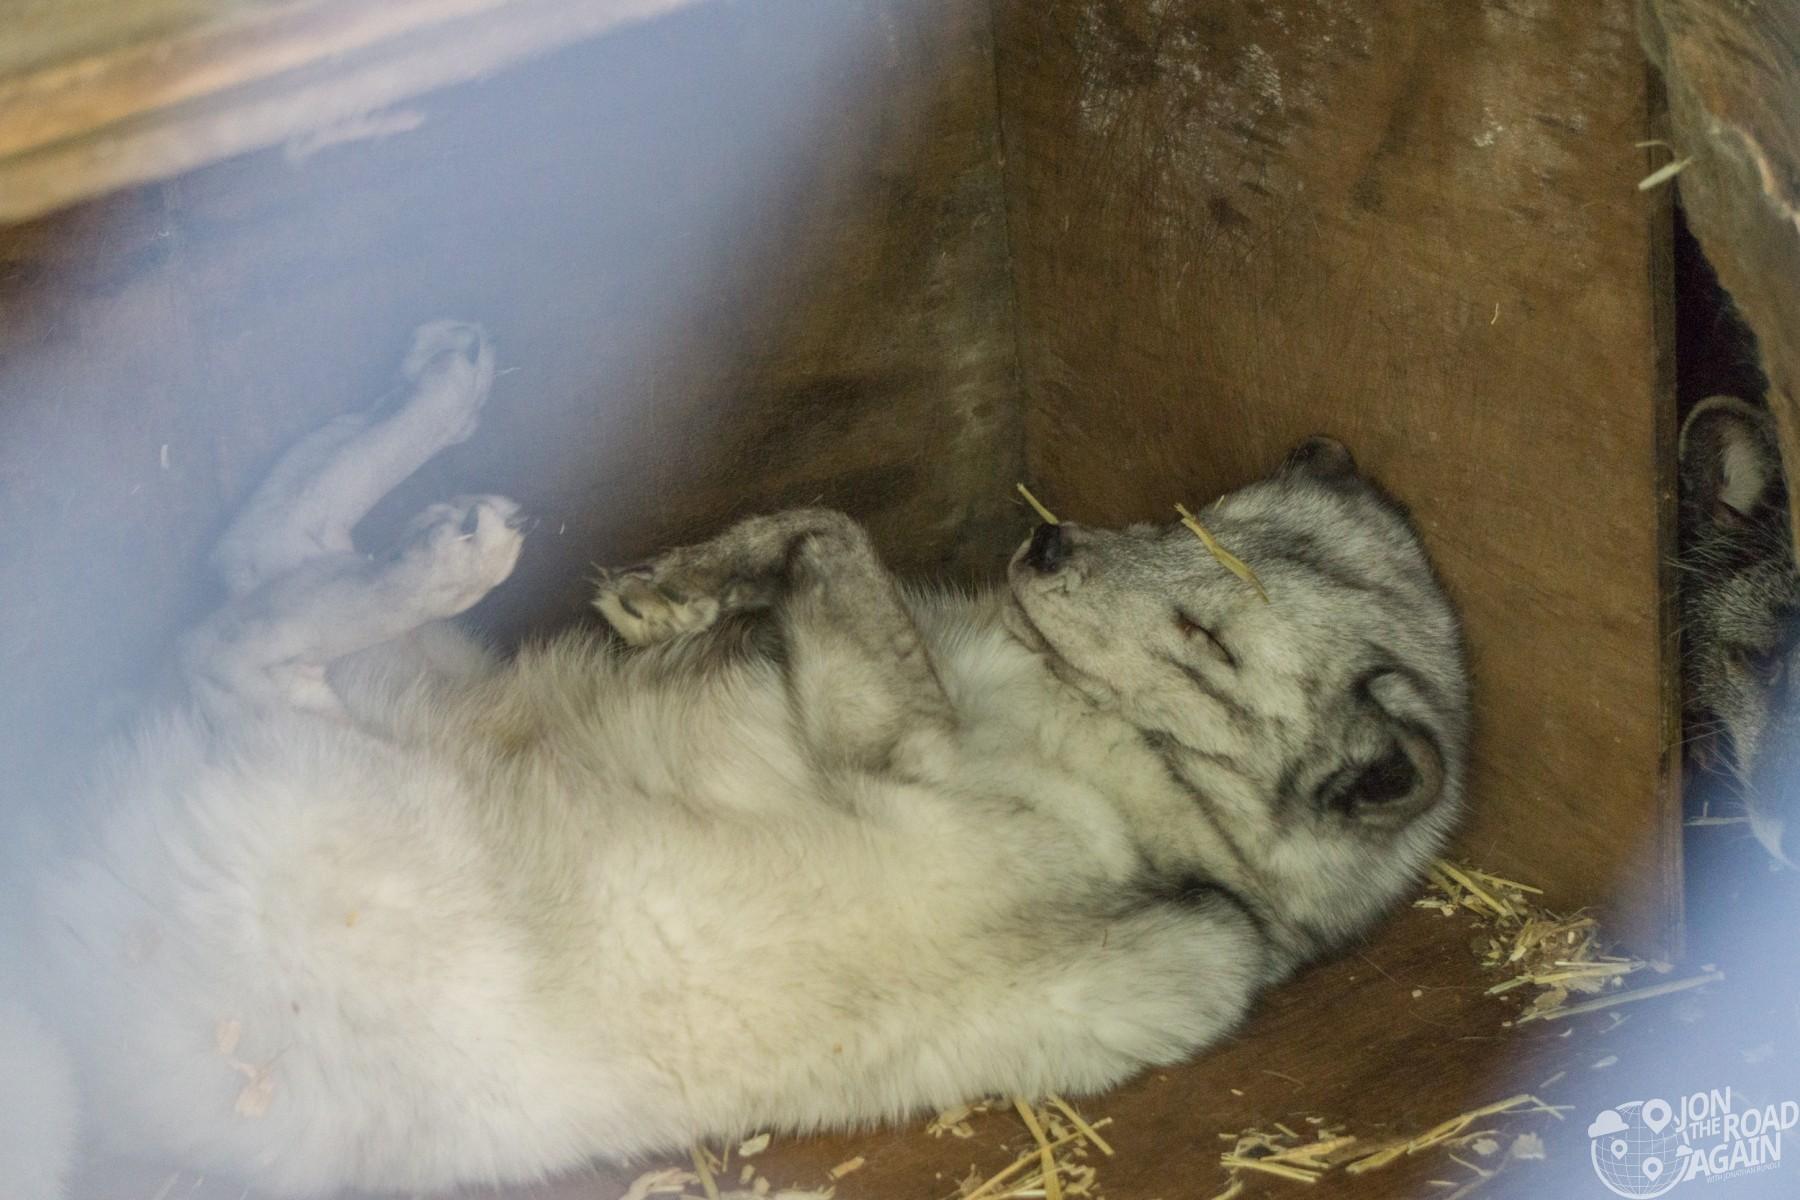 captive fox sleeping